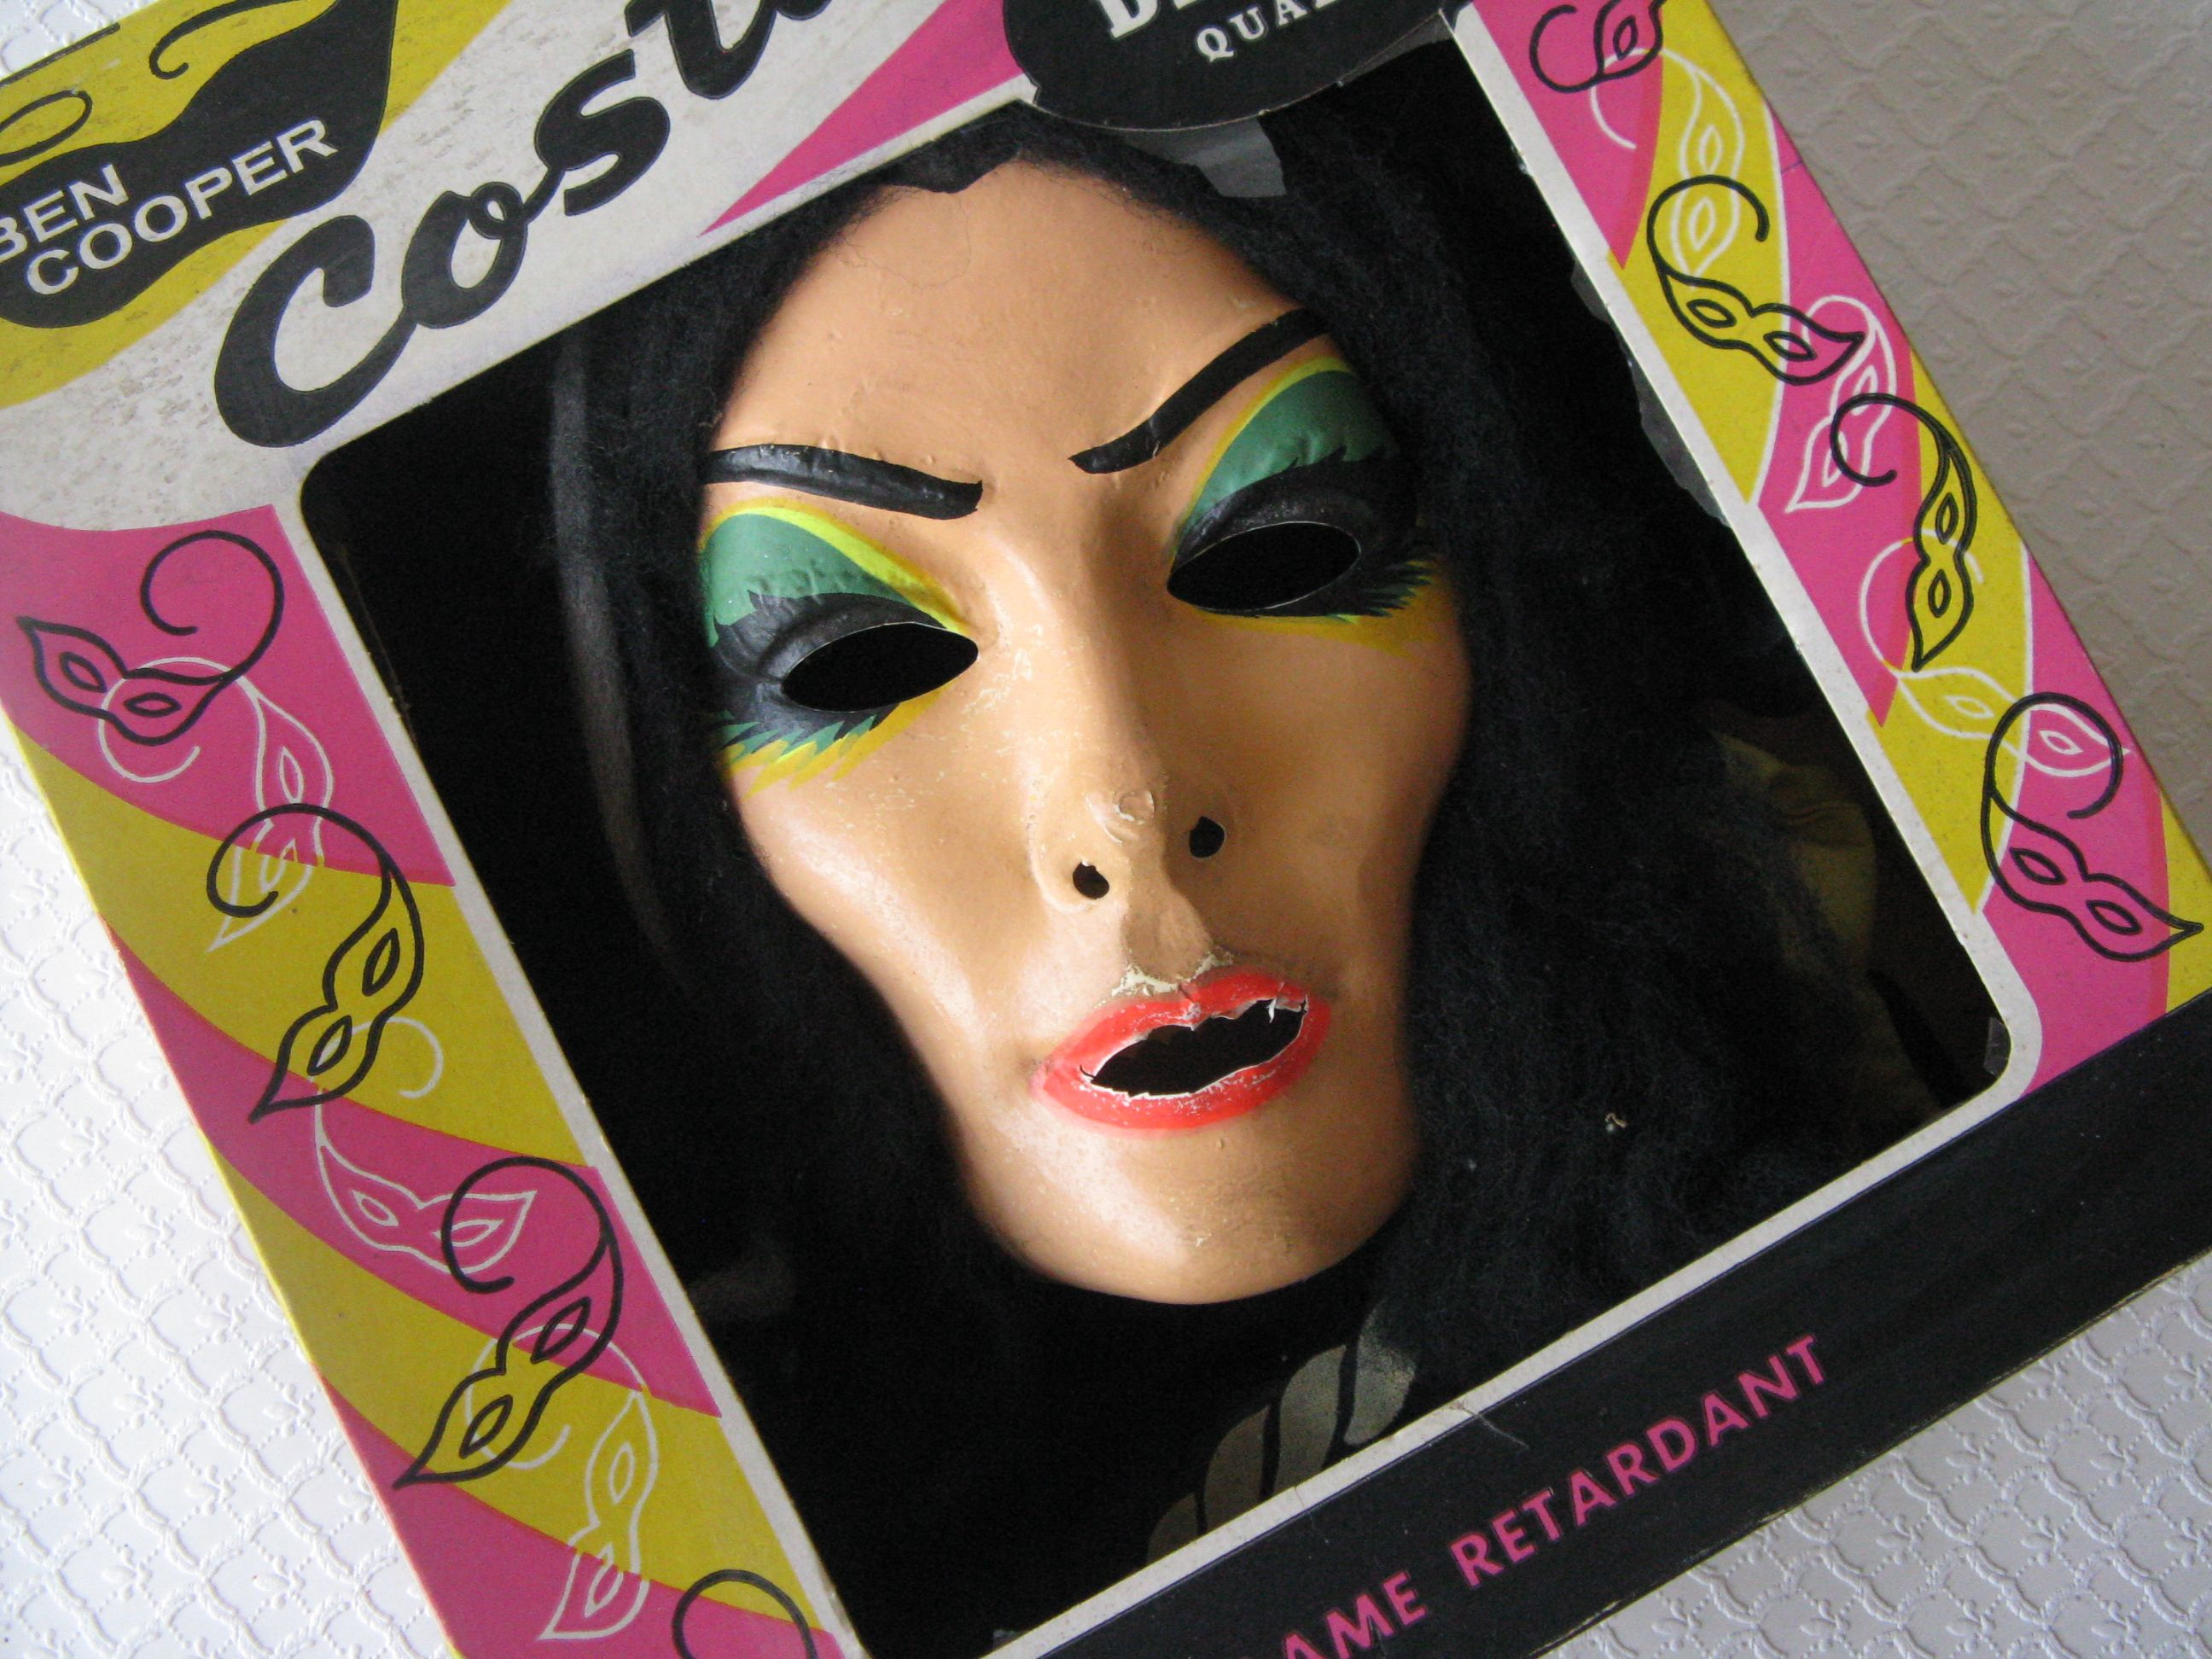 Lily munster costume.. Lily munster costume, Halloween